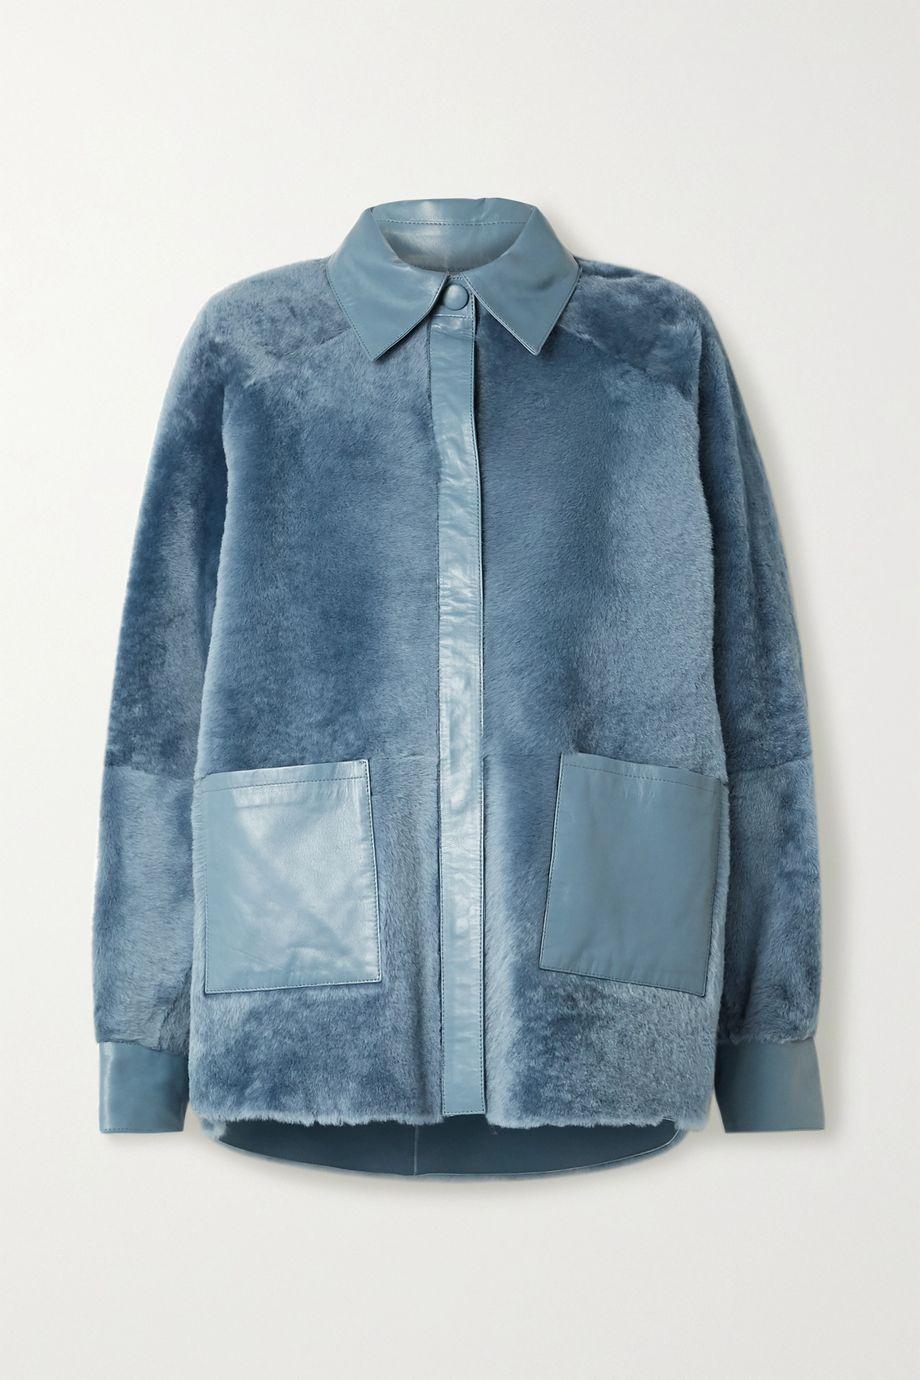 REMAIN Birger Christensen Beiru leather-trimmed shearling jacket